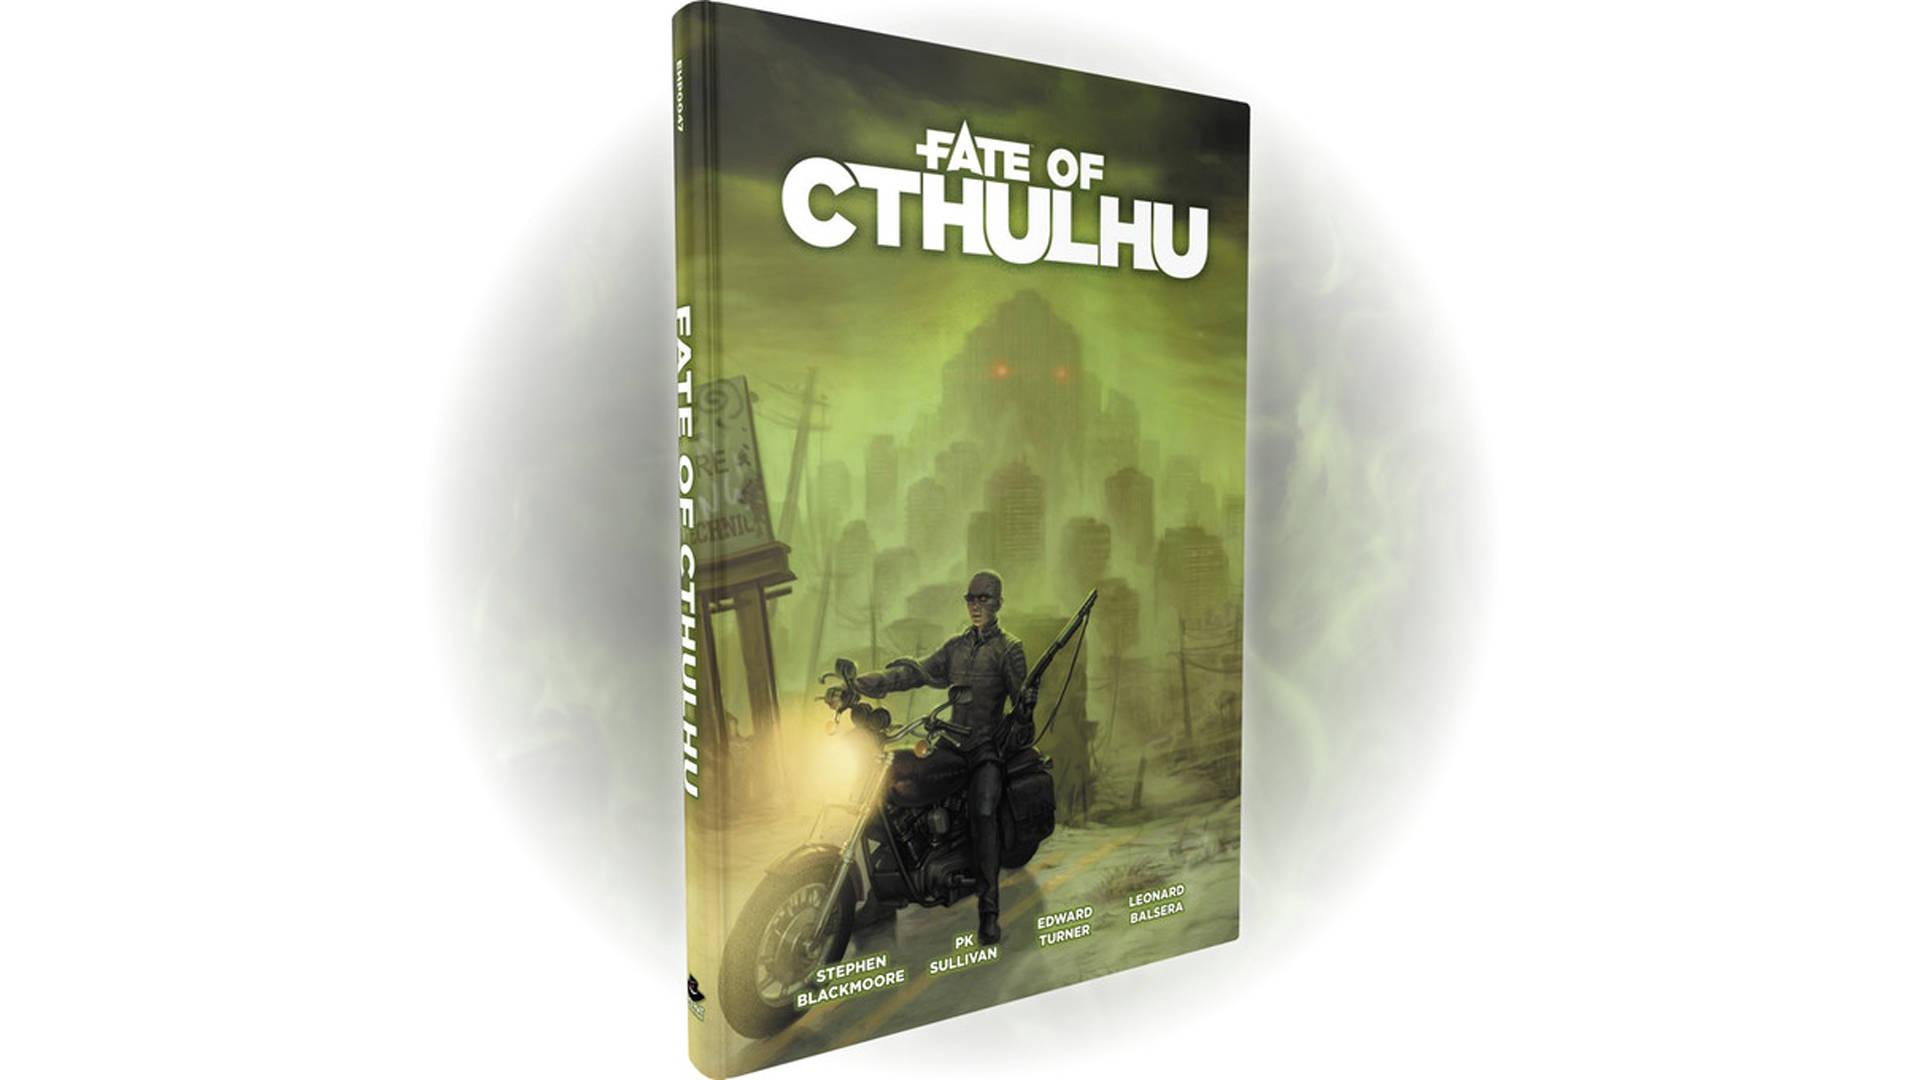 Fate of Cthulhu